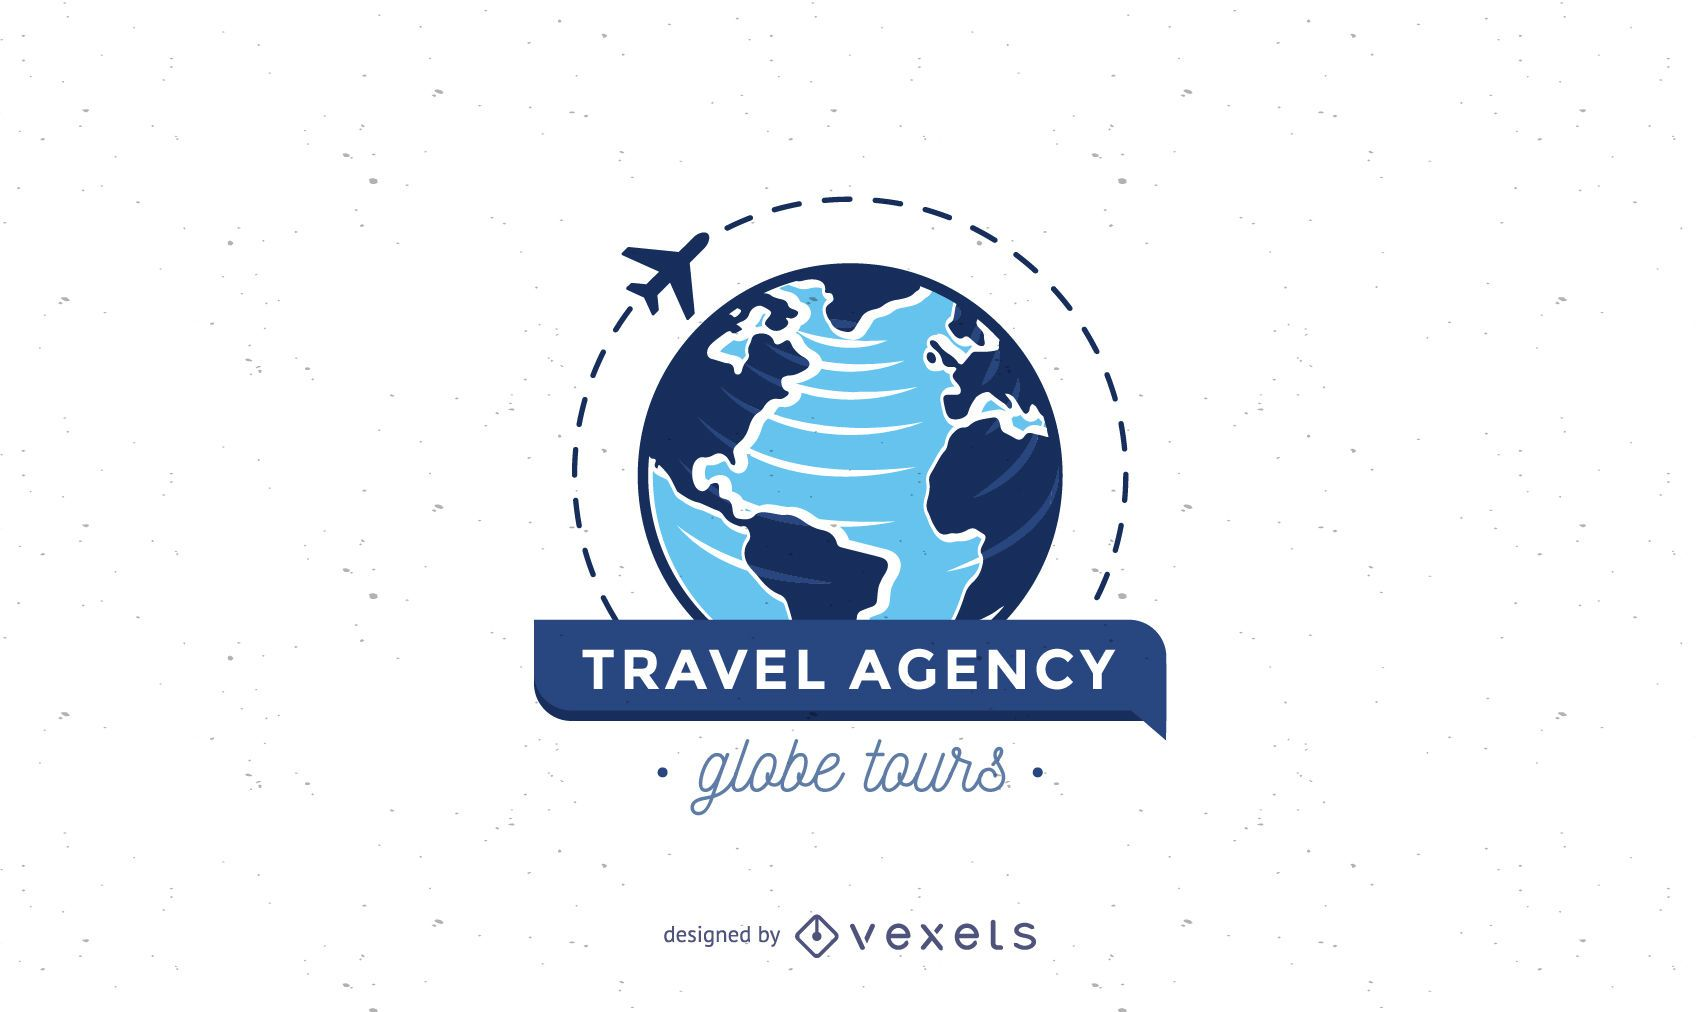 Travel agency logo template